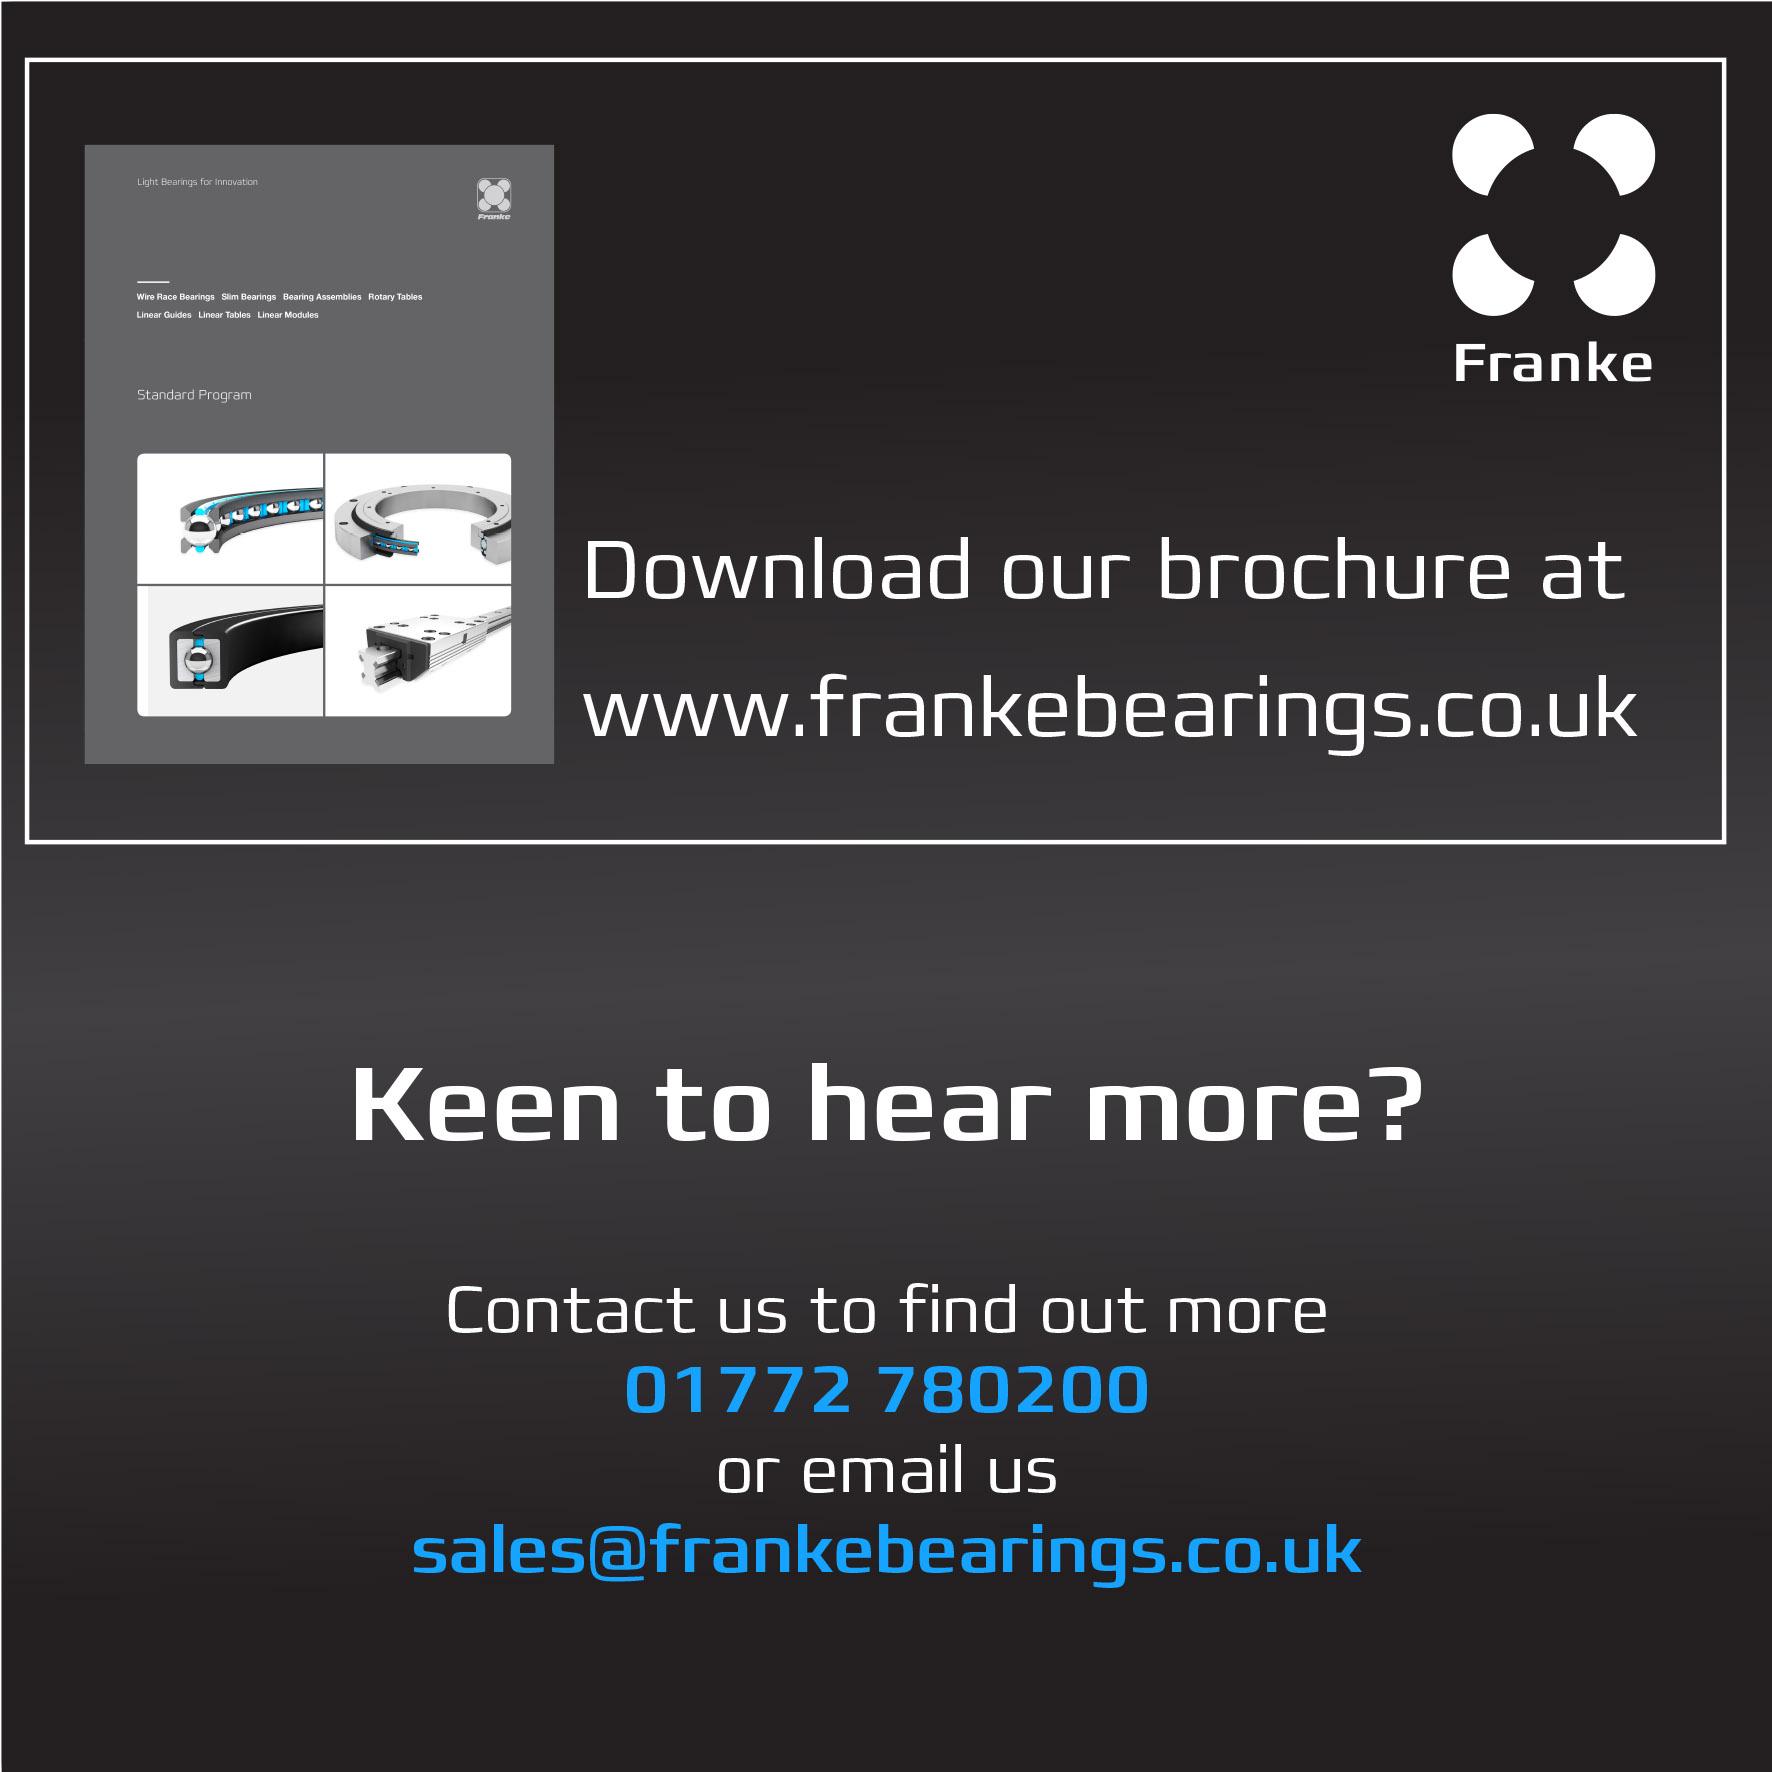 brochure download back cover